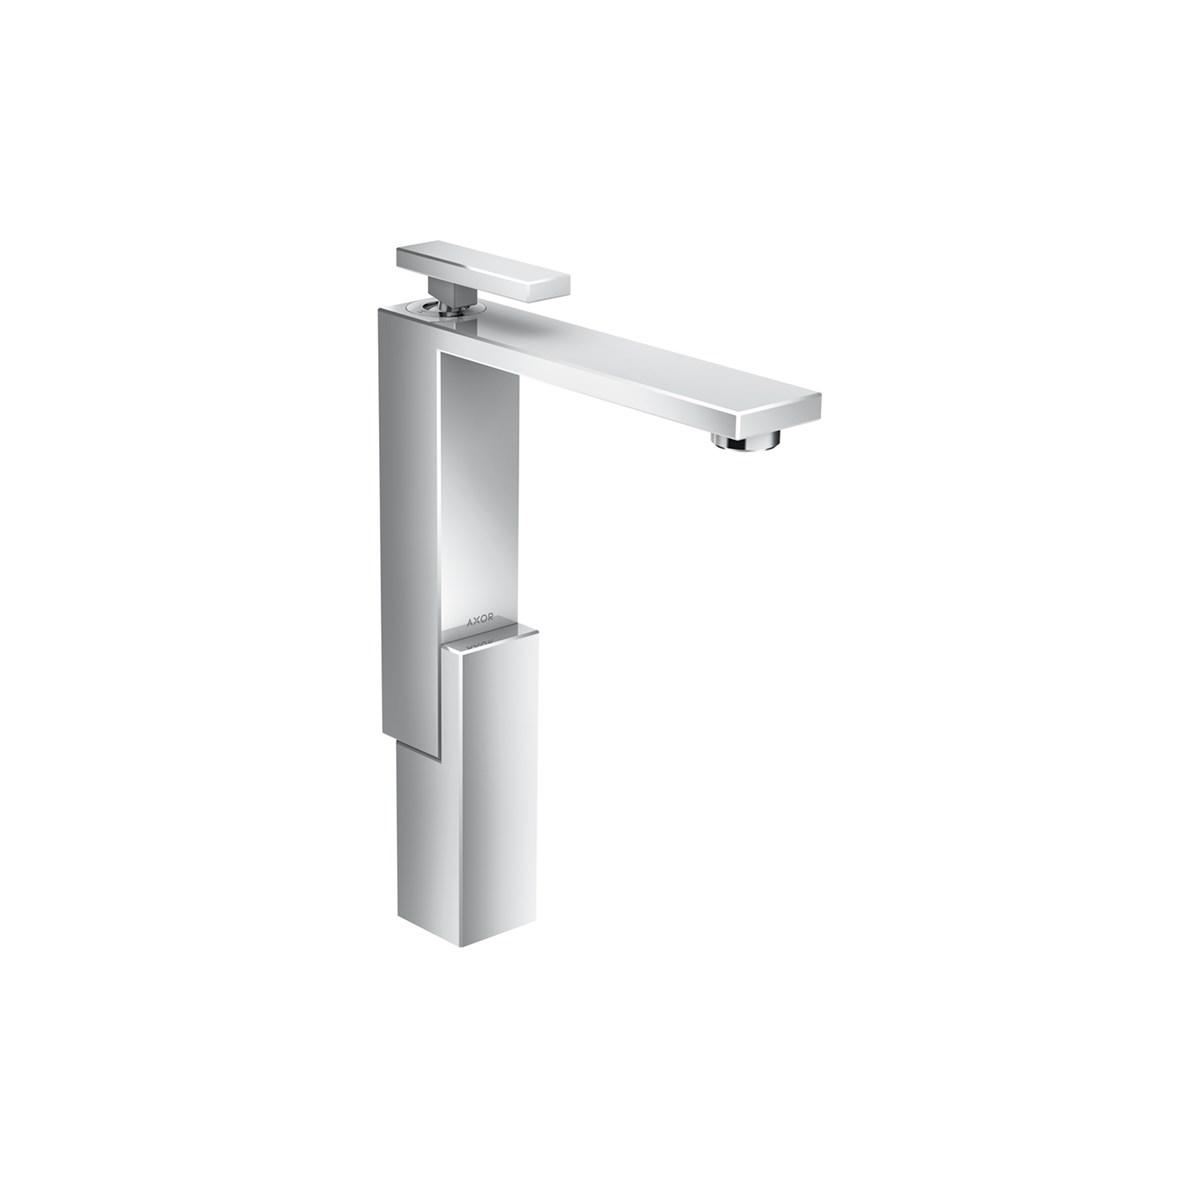 Hansgrohe-Jean-Marie-Massaud-AXOR-Edge-Basin-Mixer-280-46030000-Matisse-1